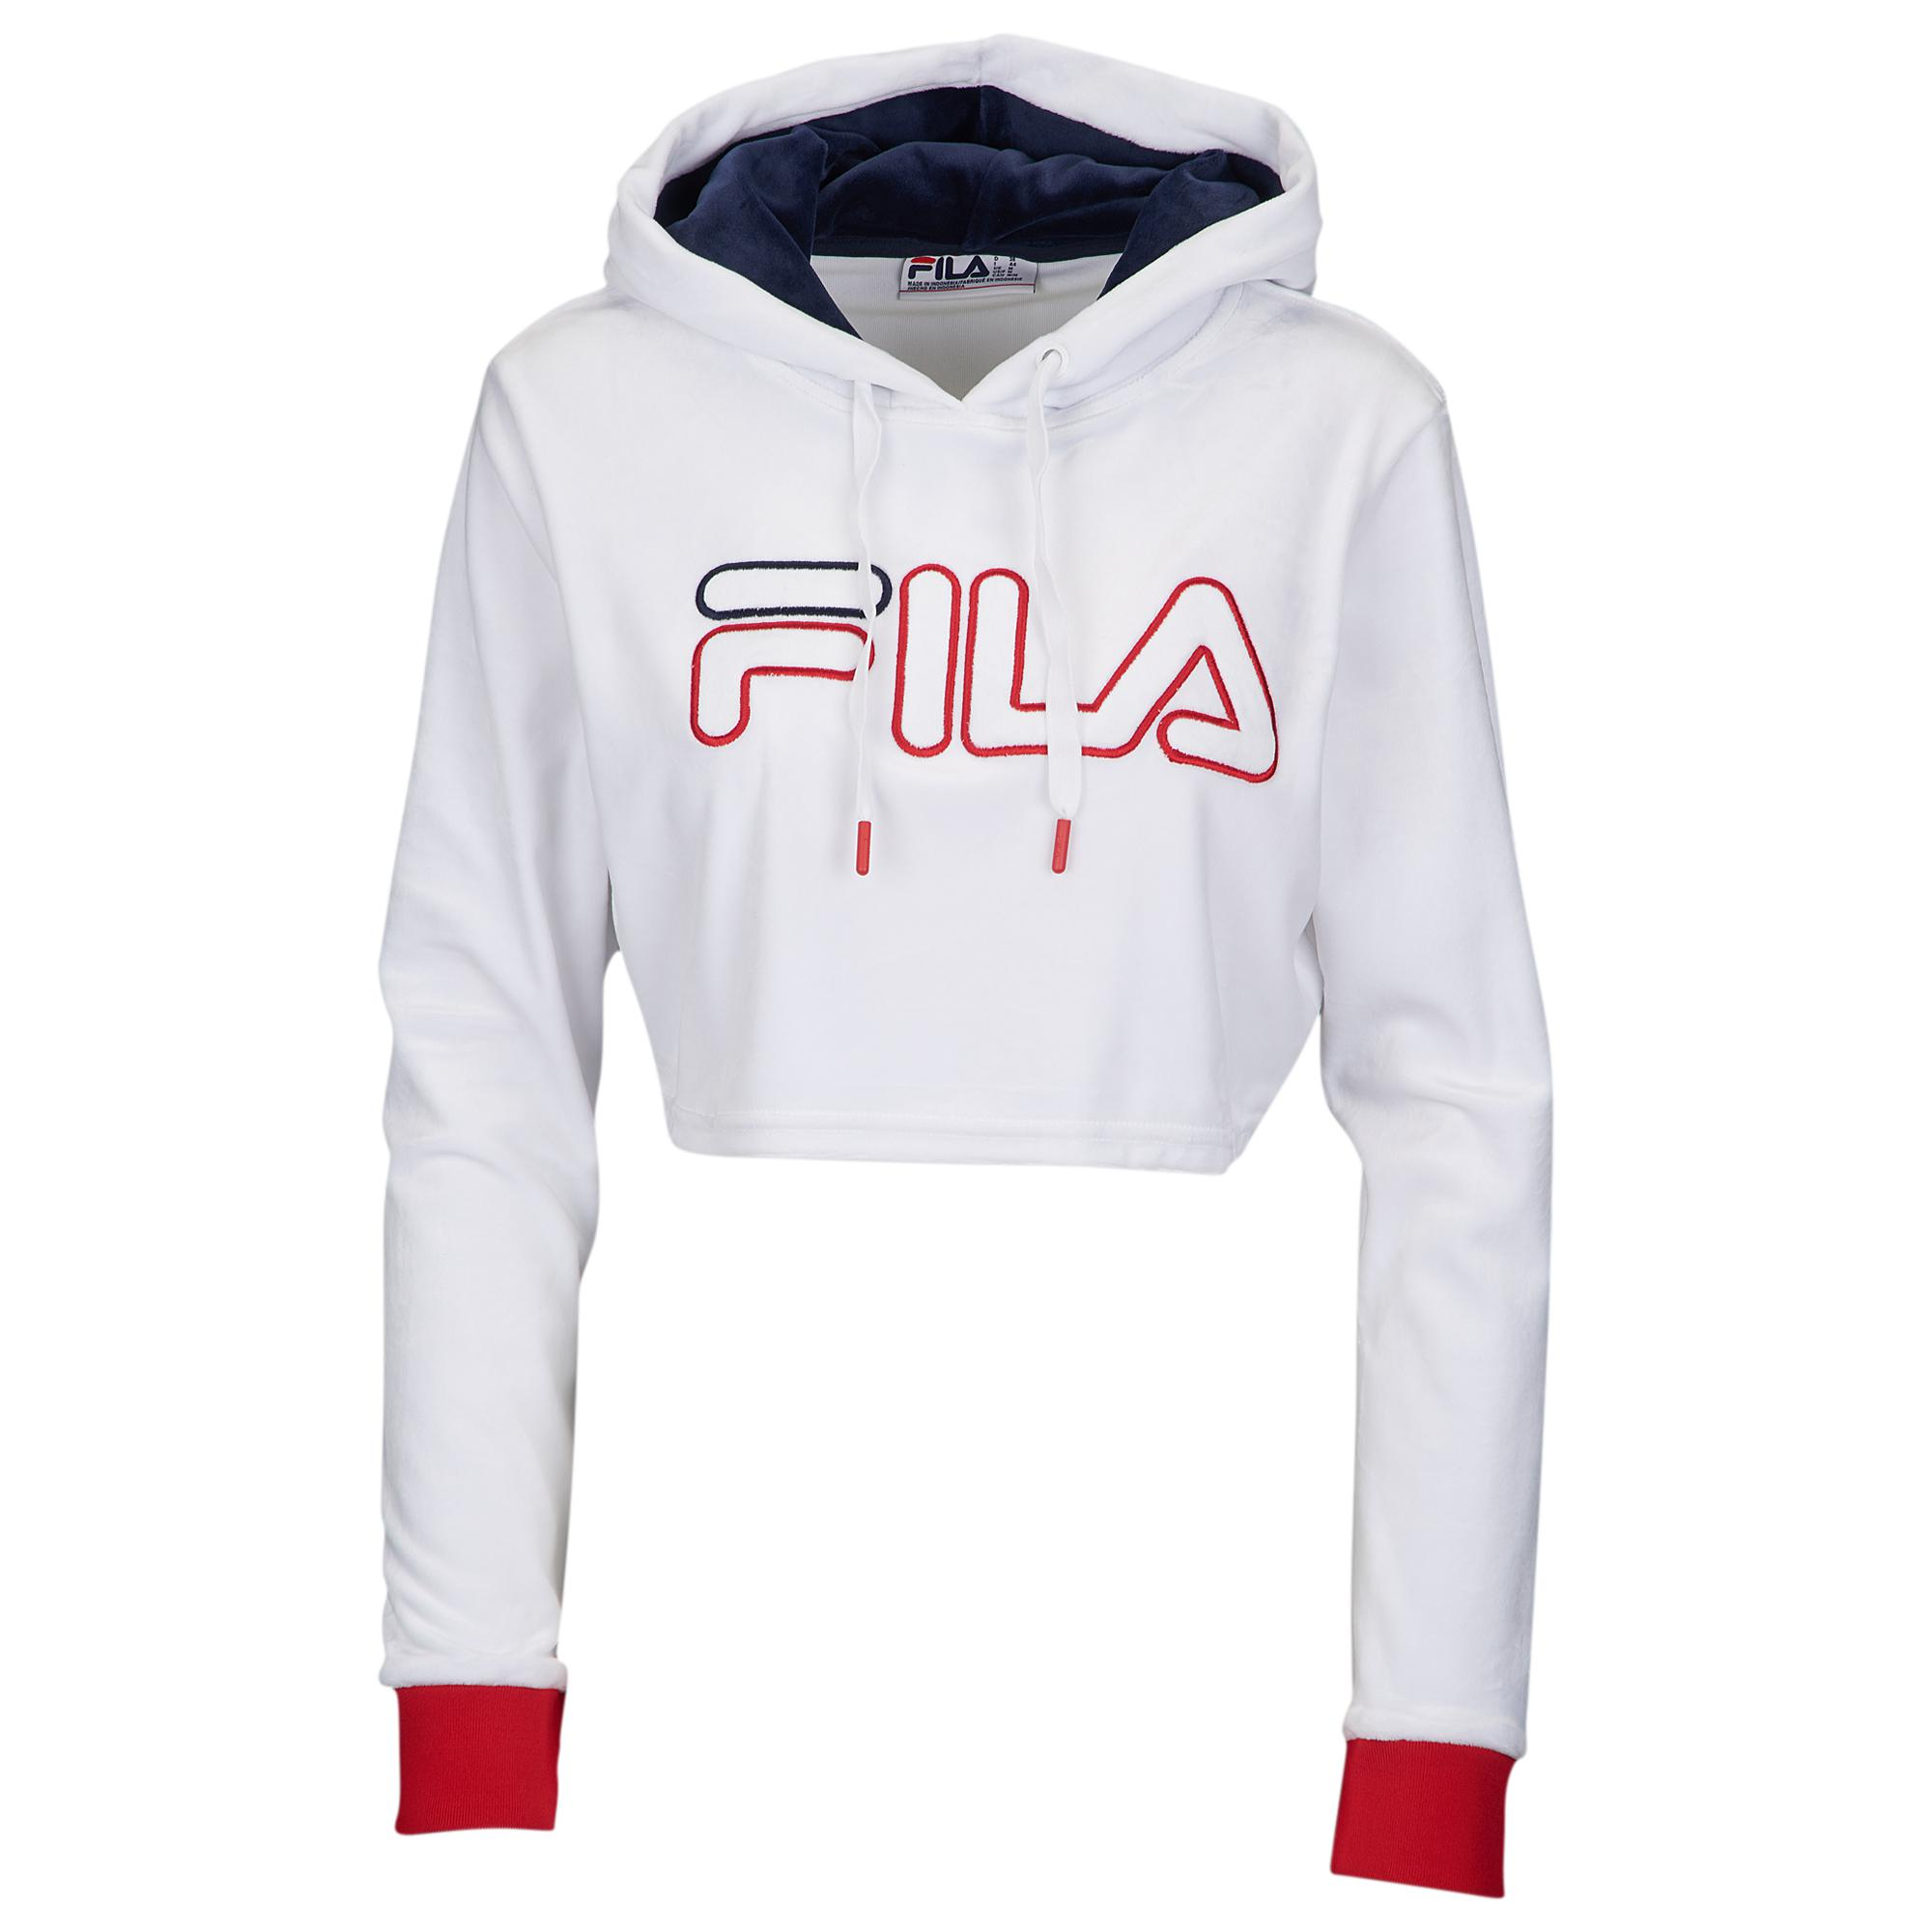 aaca6e17c6b Fila - White Velour Crop Hoodie - Lyst. View fullscreen